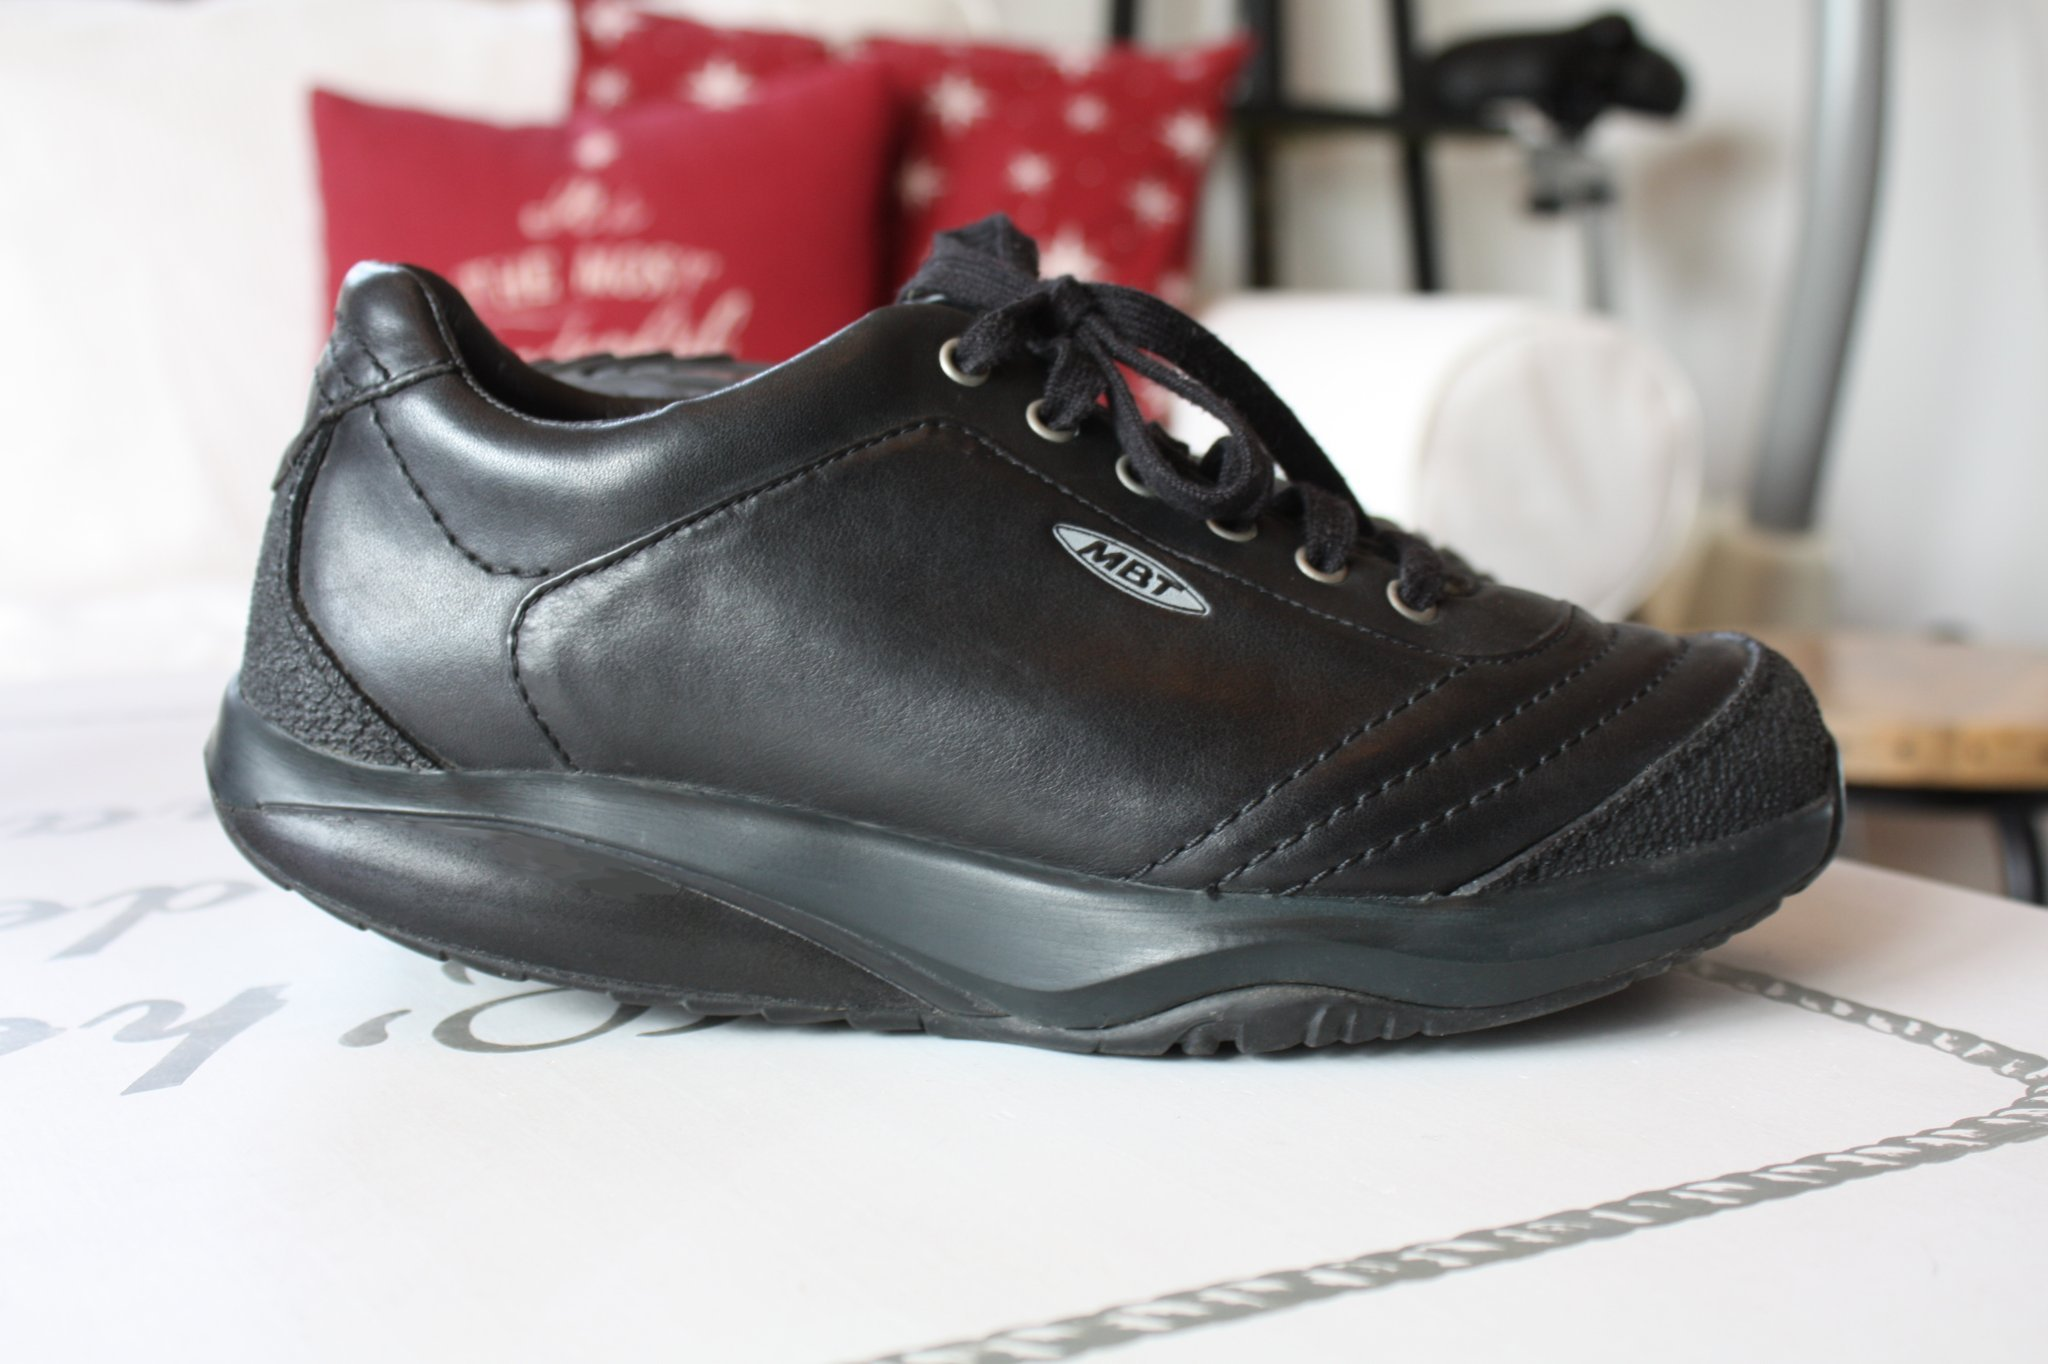 8da17fdc078 Nypris: 2599:-! Nästan NYA MBT skor i svart, st.. (347966246) ᐈ Köp ...